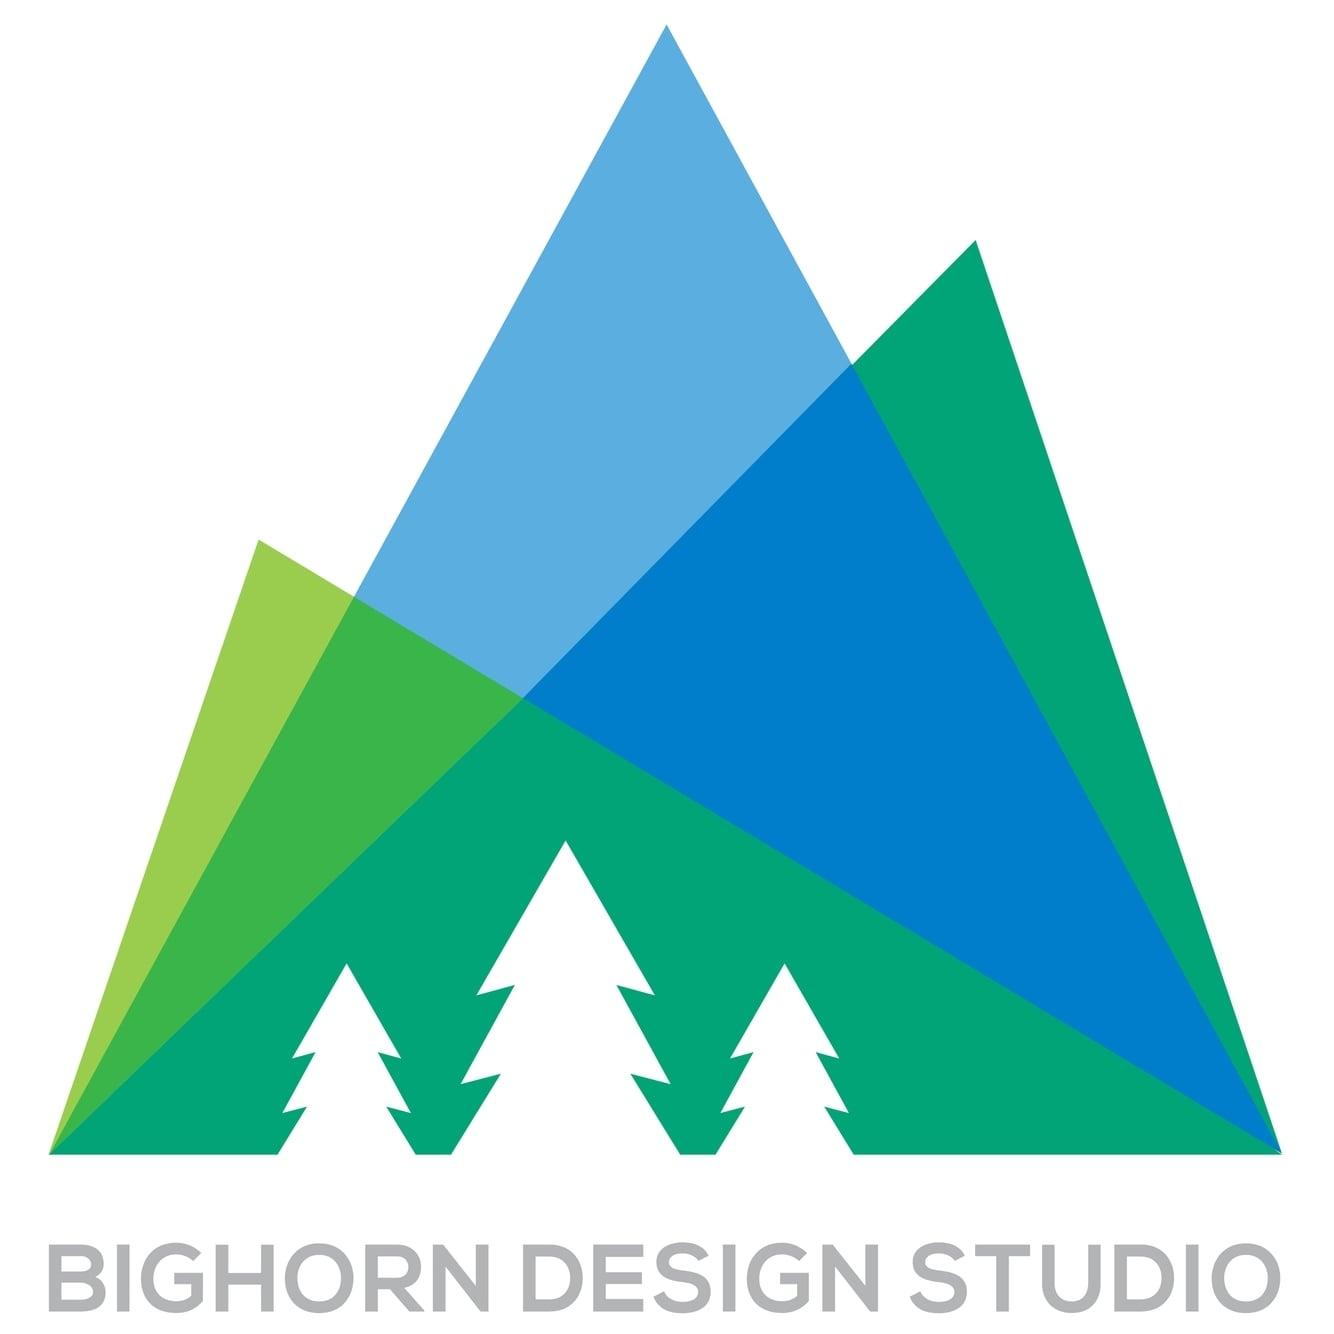 Bighorn Design Studio